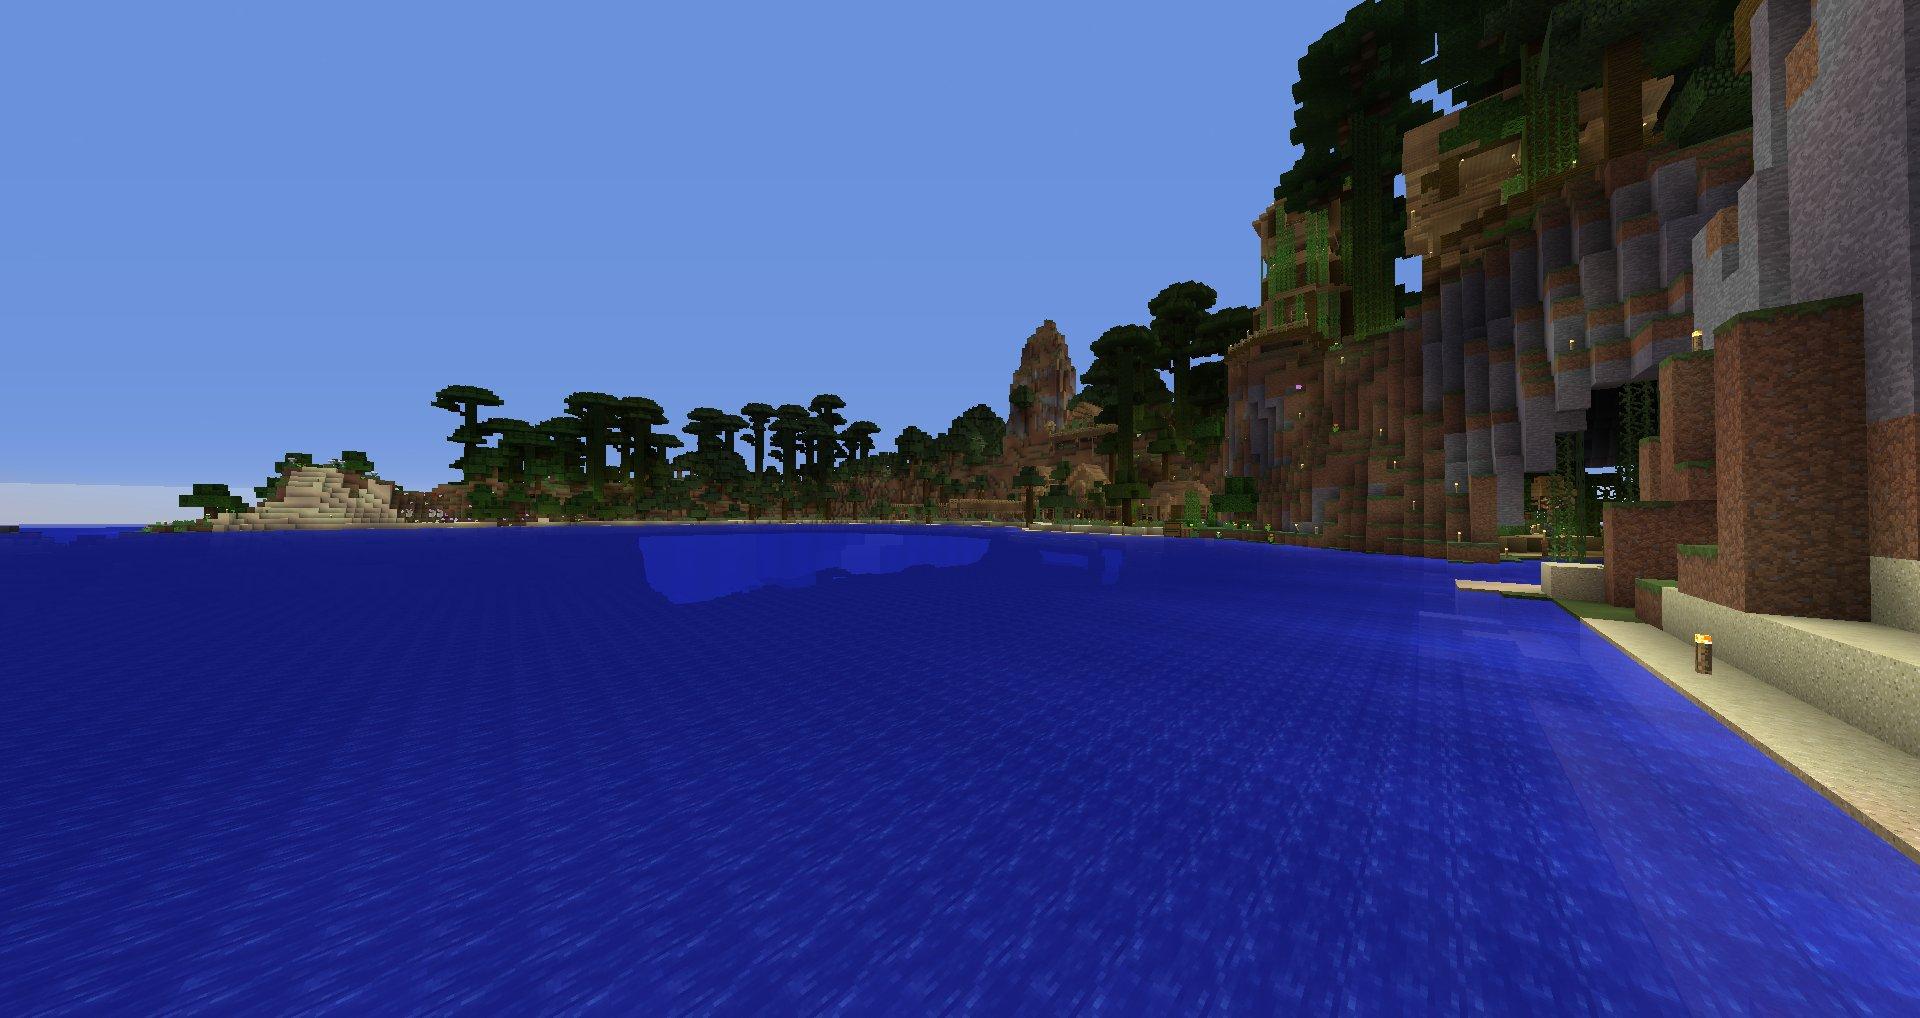 Great Inagua : La baie des pirates - Page 2 Ff020c91-8e82-4ec1-811b-43826c06bfe3